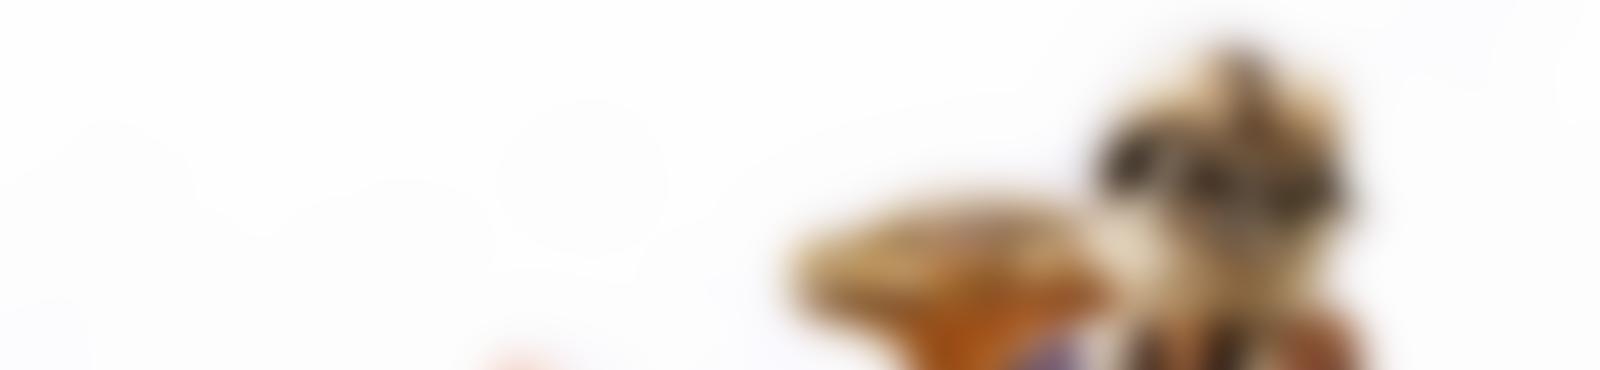 Blurred 9183e56d f31f 4b34 9eed fc1e07cdfa47